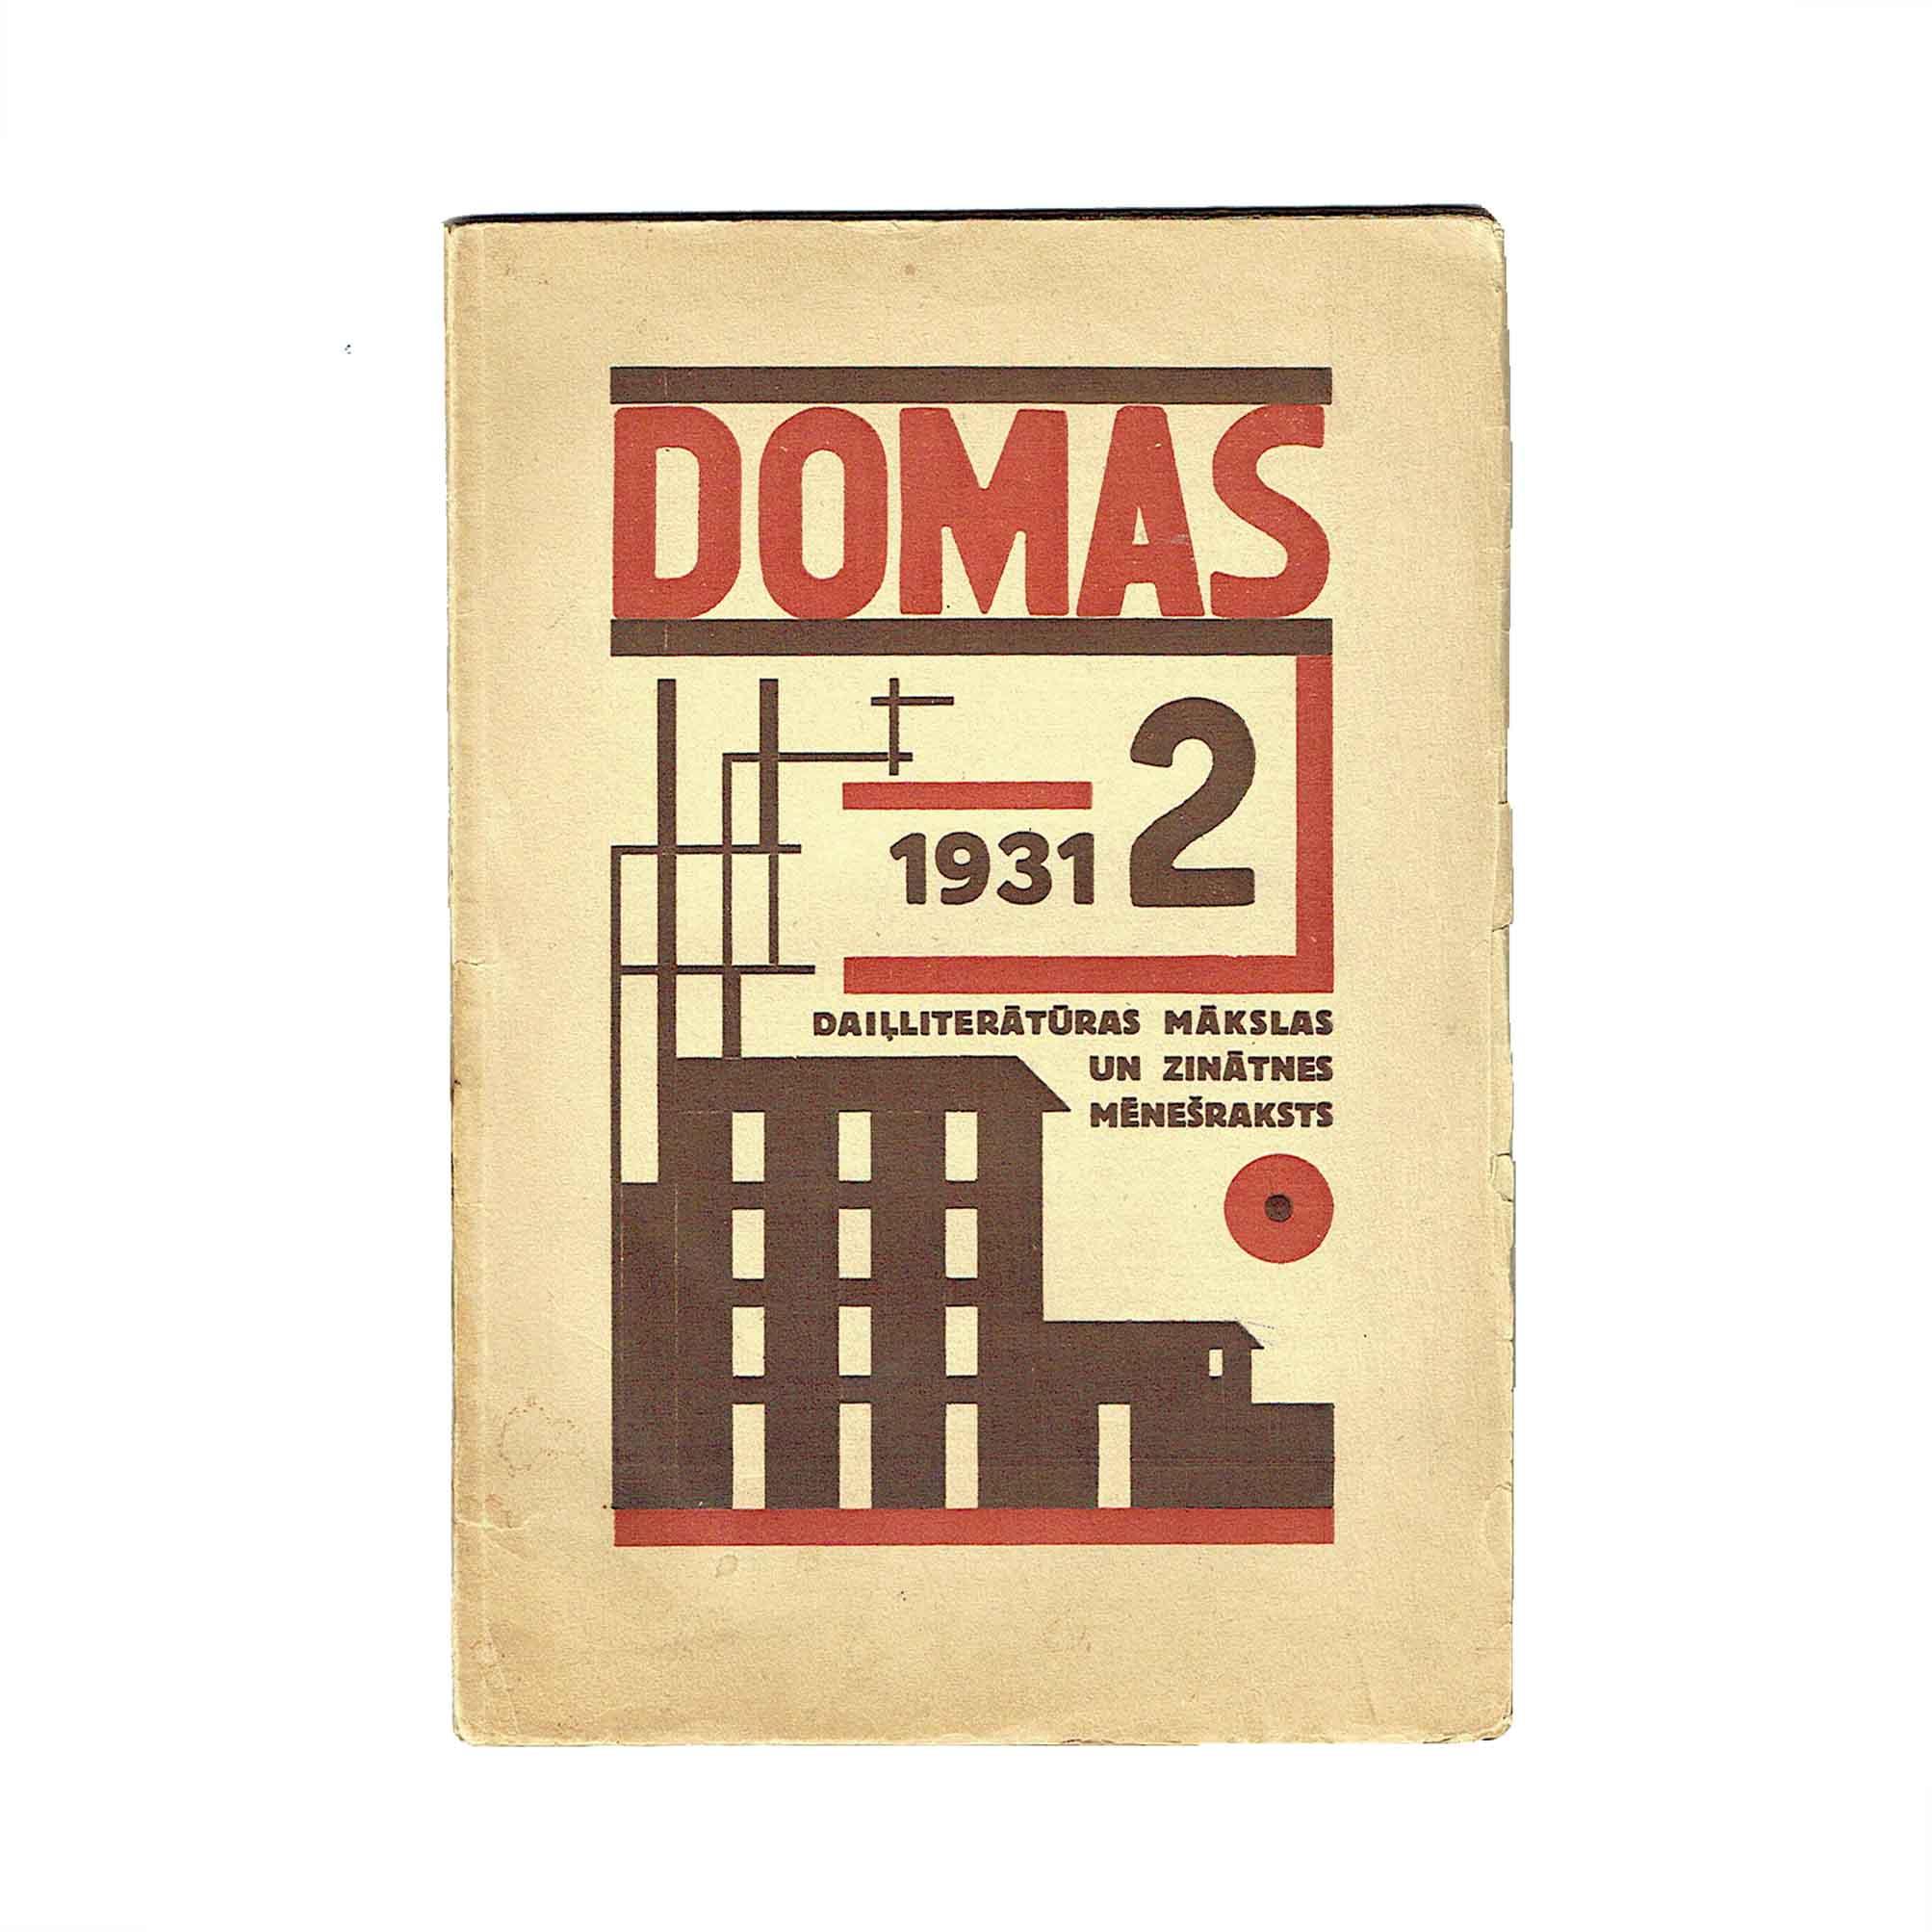 5553-Domas-VIII-2-Strunke-Cover-free-N.jpg